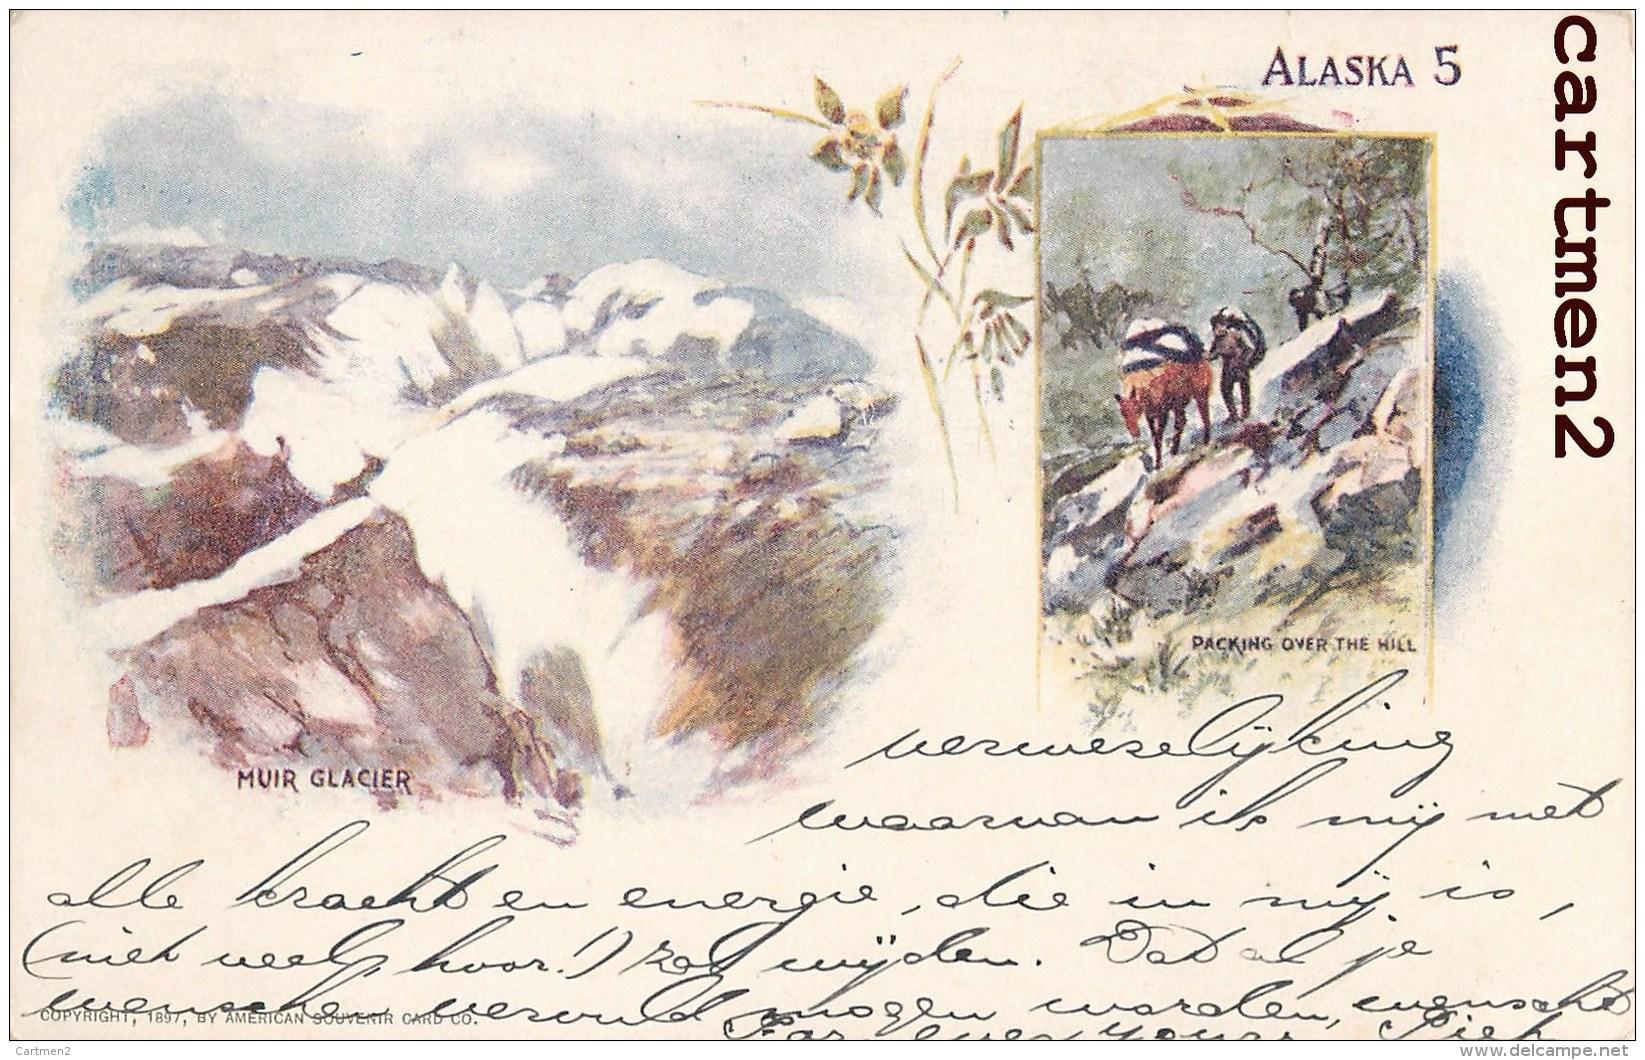 ALASKA GLACIER PACKING 1900 UNITED-STATES - Unclassified